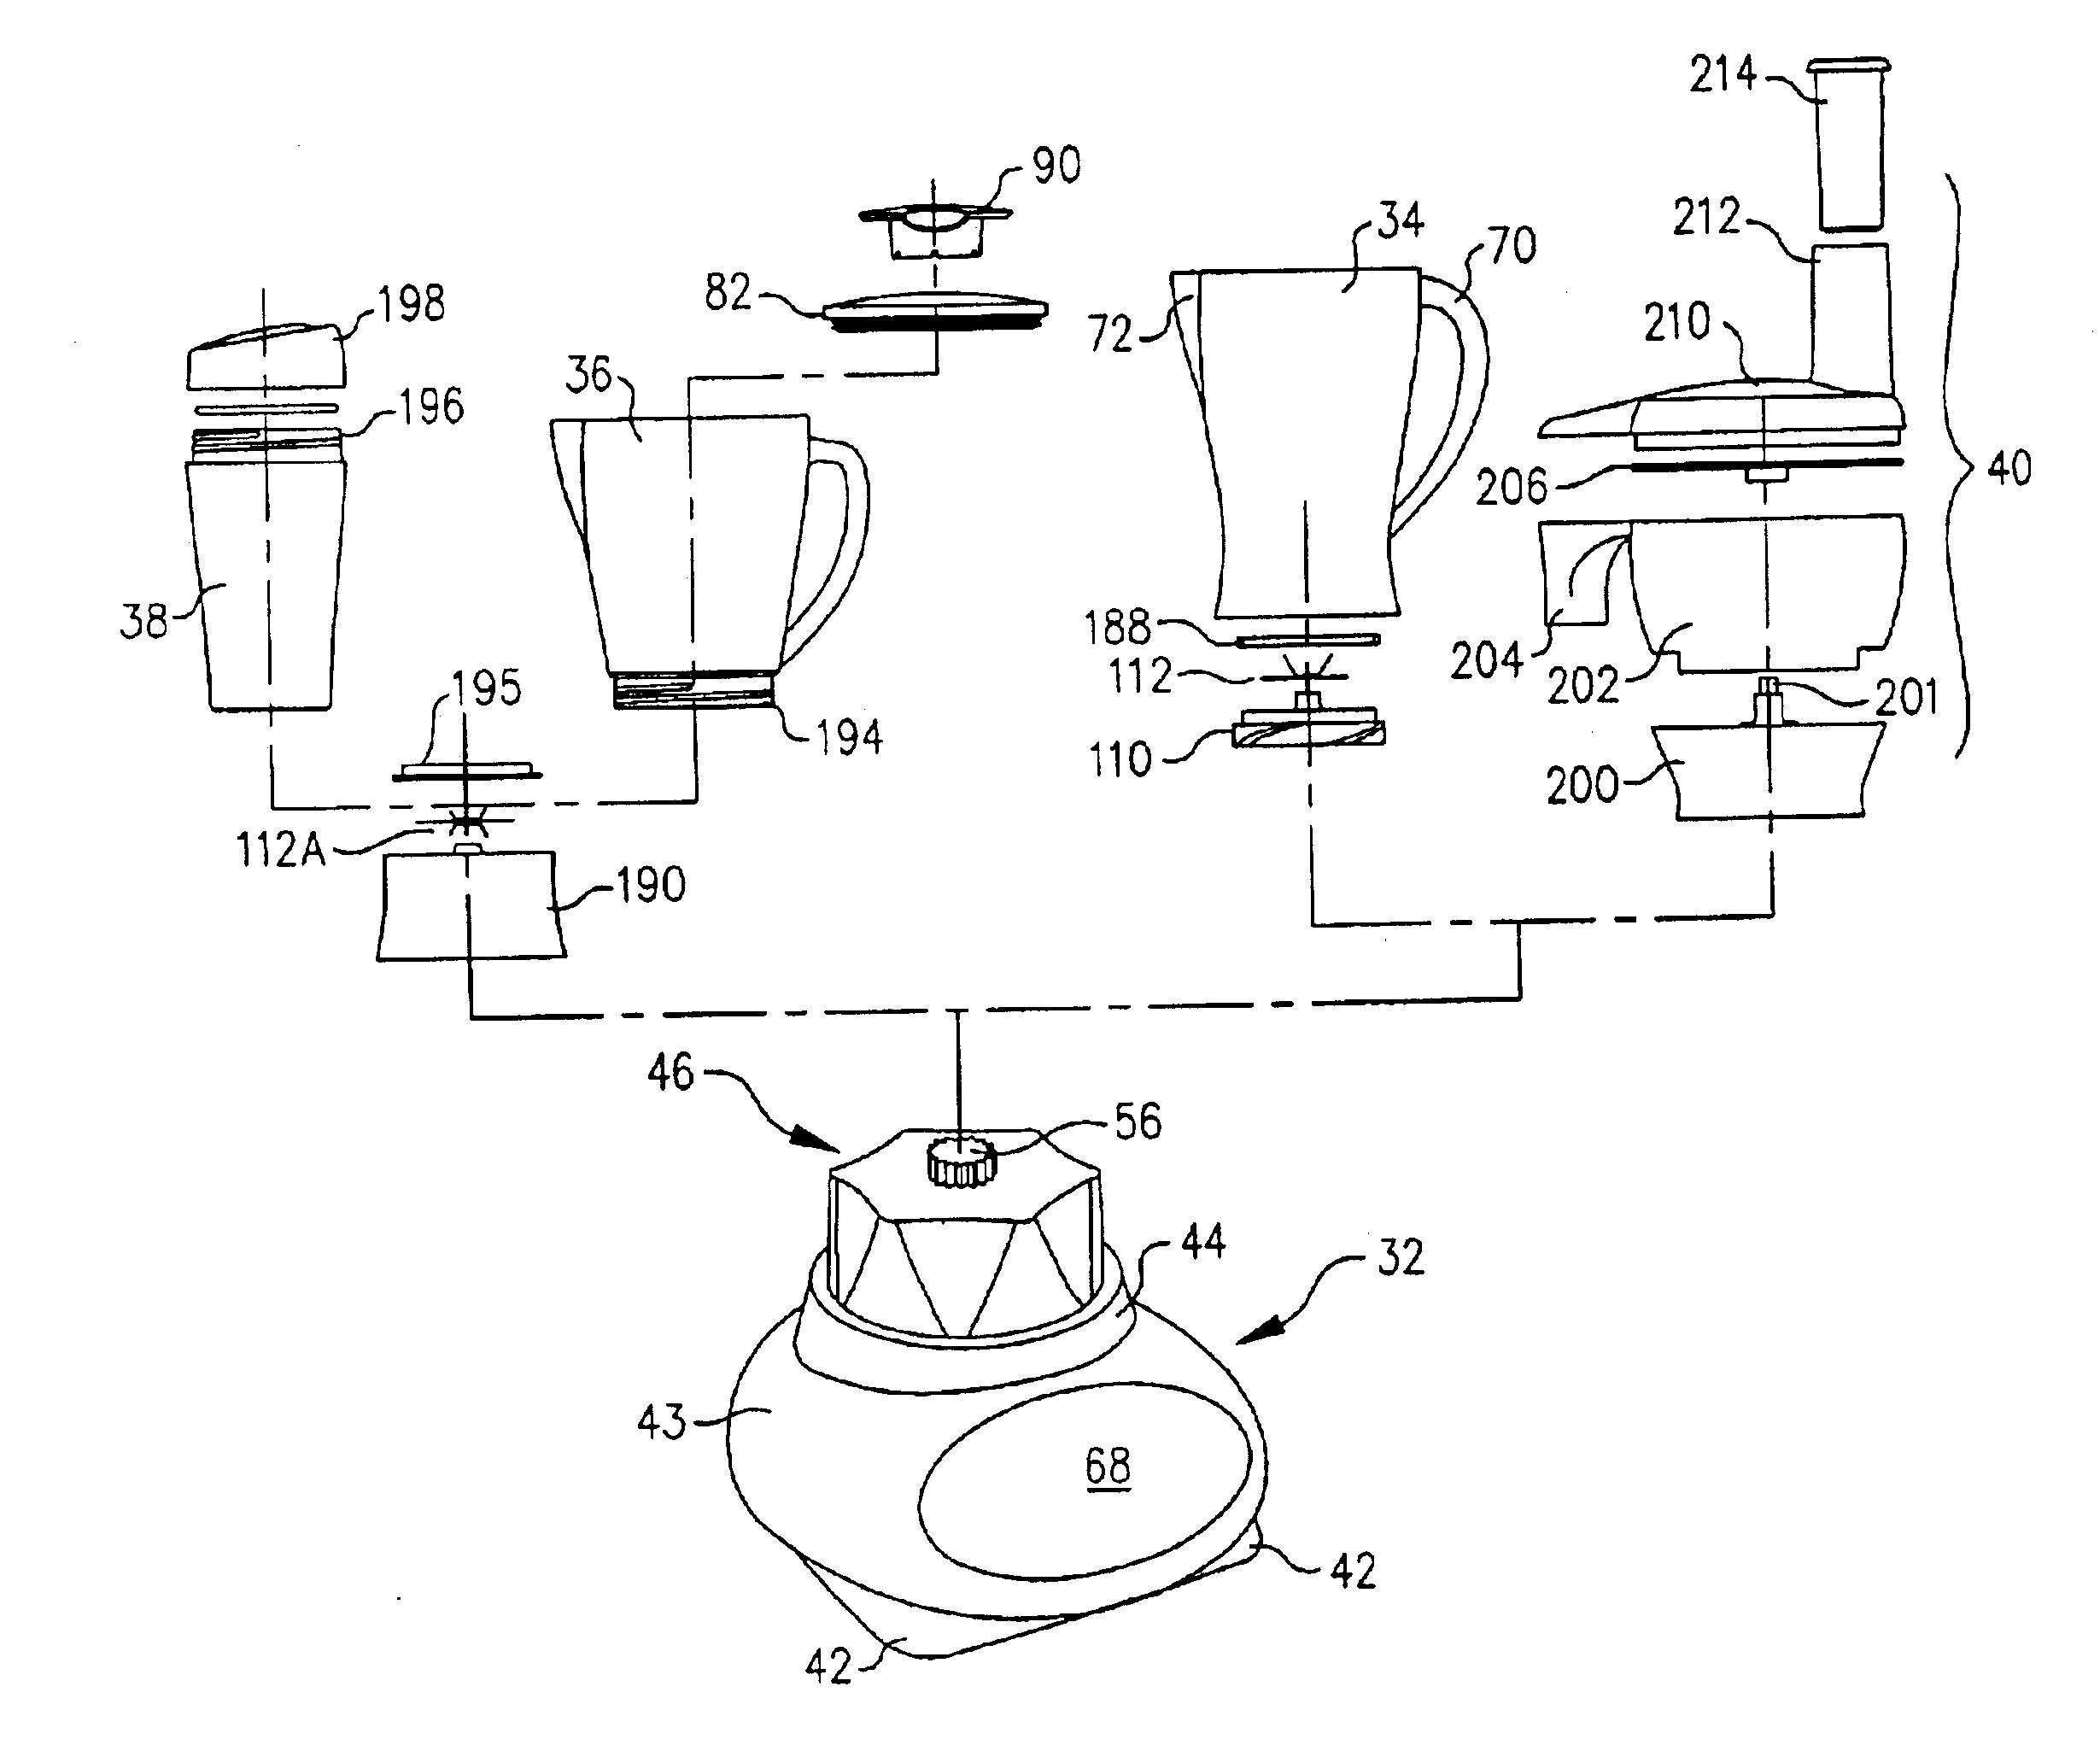 Philips Mixer Grinder Circuit Diagram